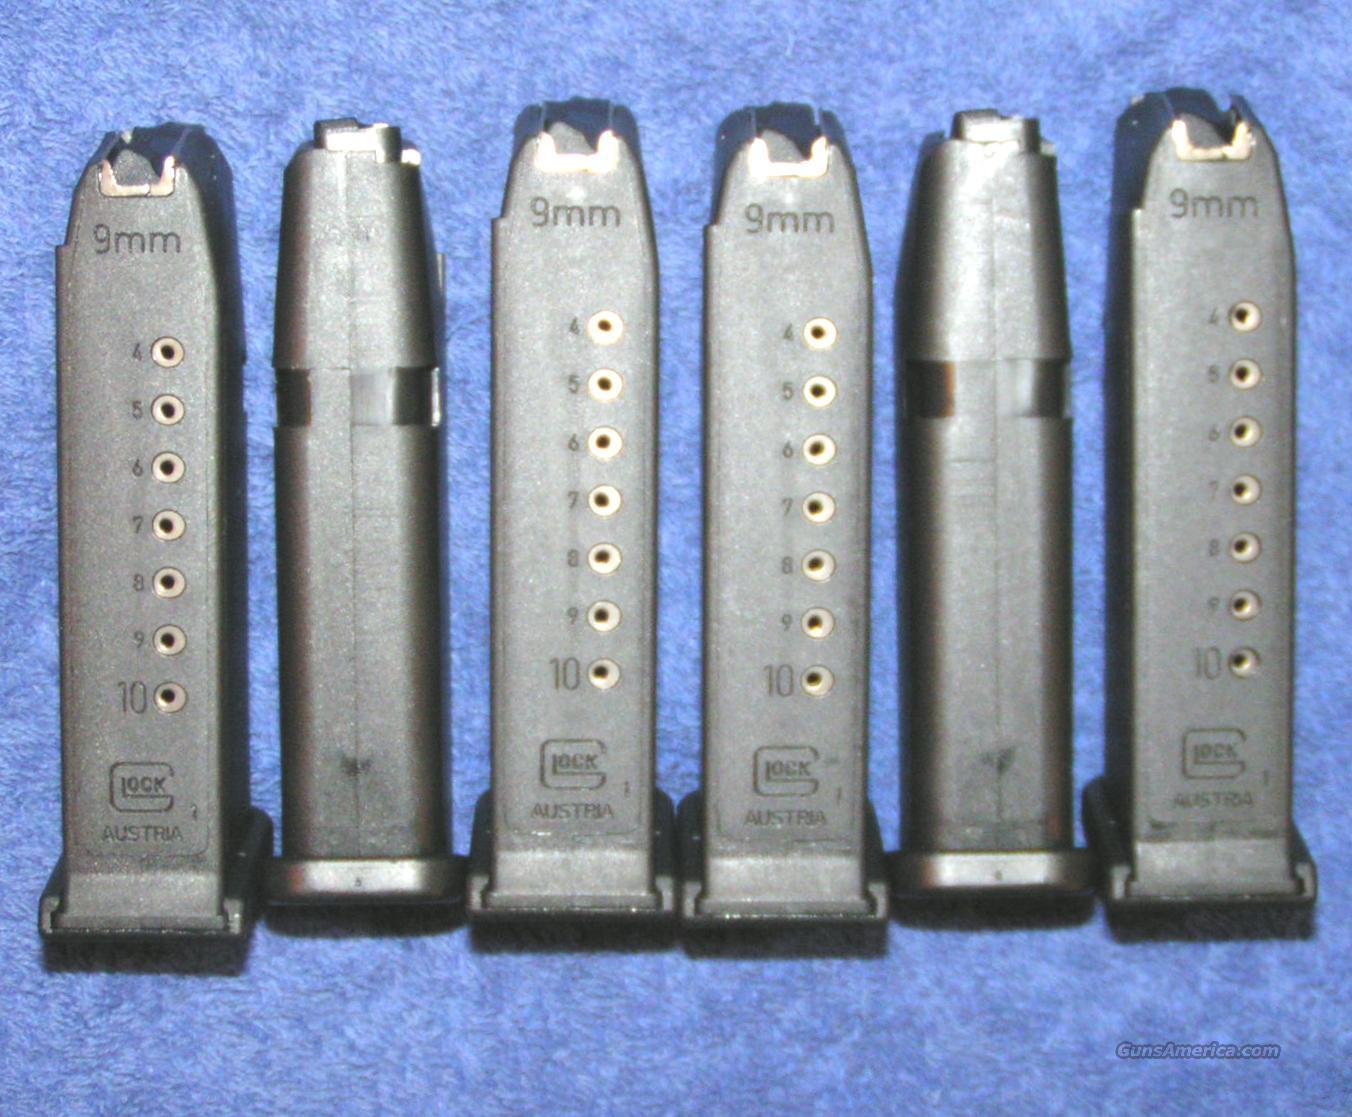 6 Glock 19 mags. New factory 9mm 10 round $23 ea  Non-Guns > Magazines & Clips > Pistol Magazines > Glock